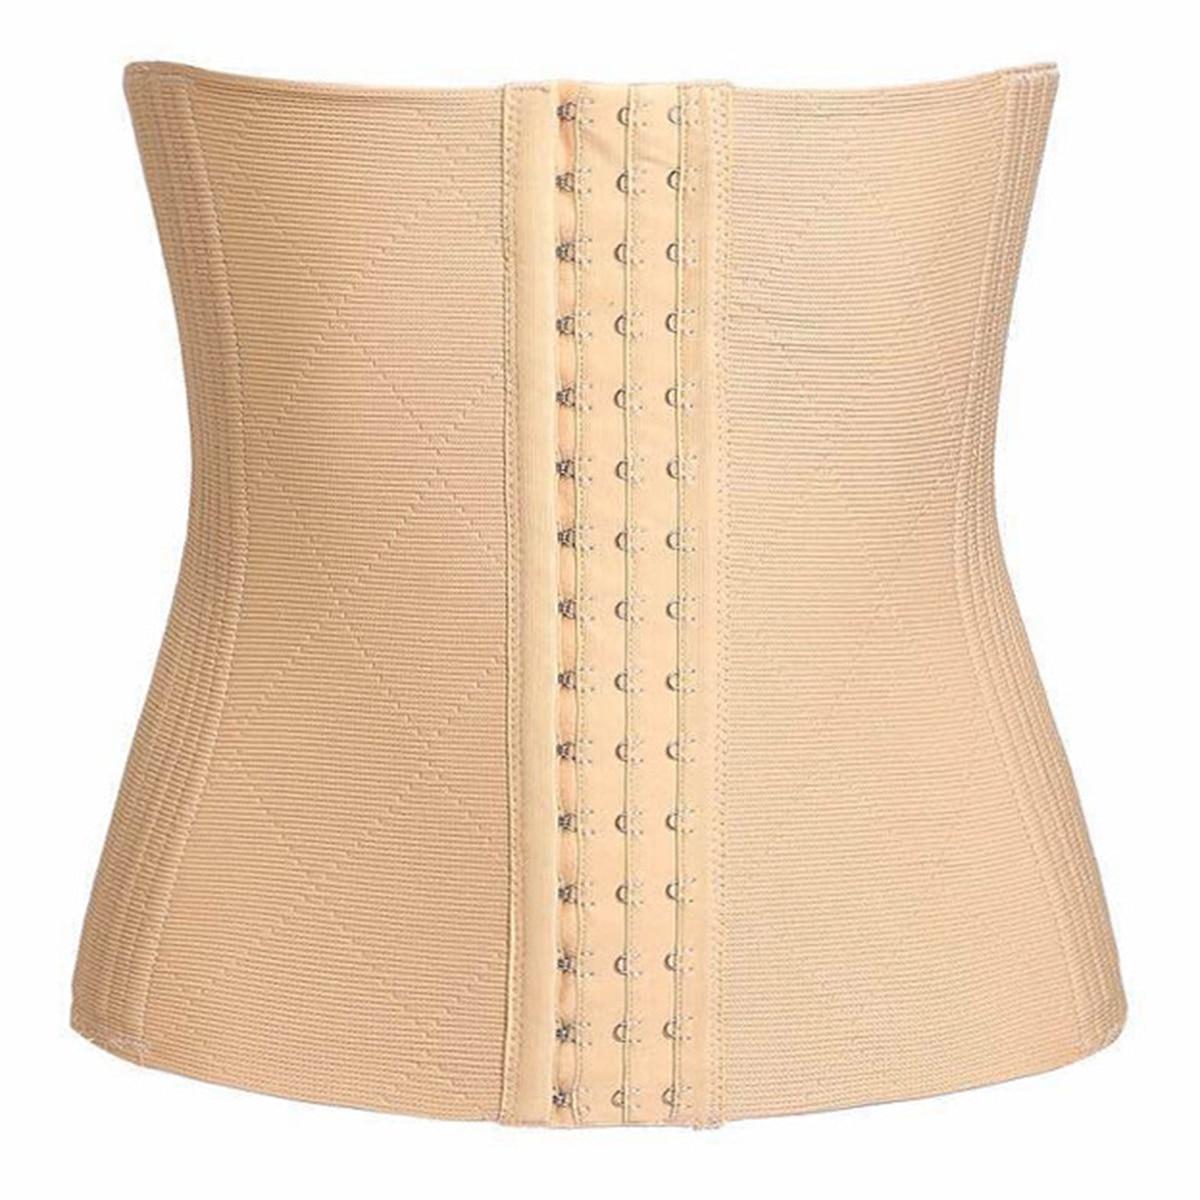 Waist Trainer Slimming Underwear Cincher Corset Slimming Belt Modeling Strap Shapers Body Shaper Slimming Latex Corset